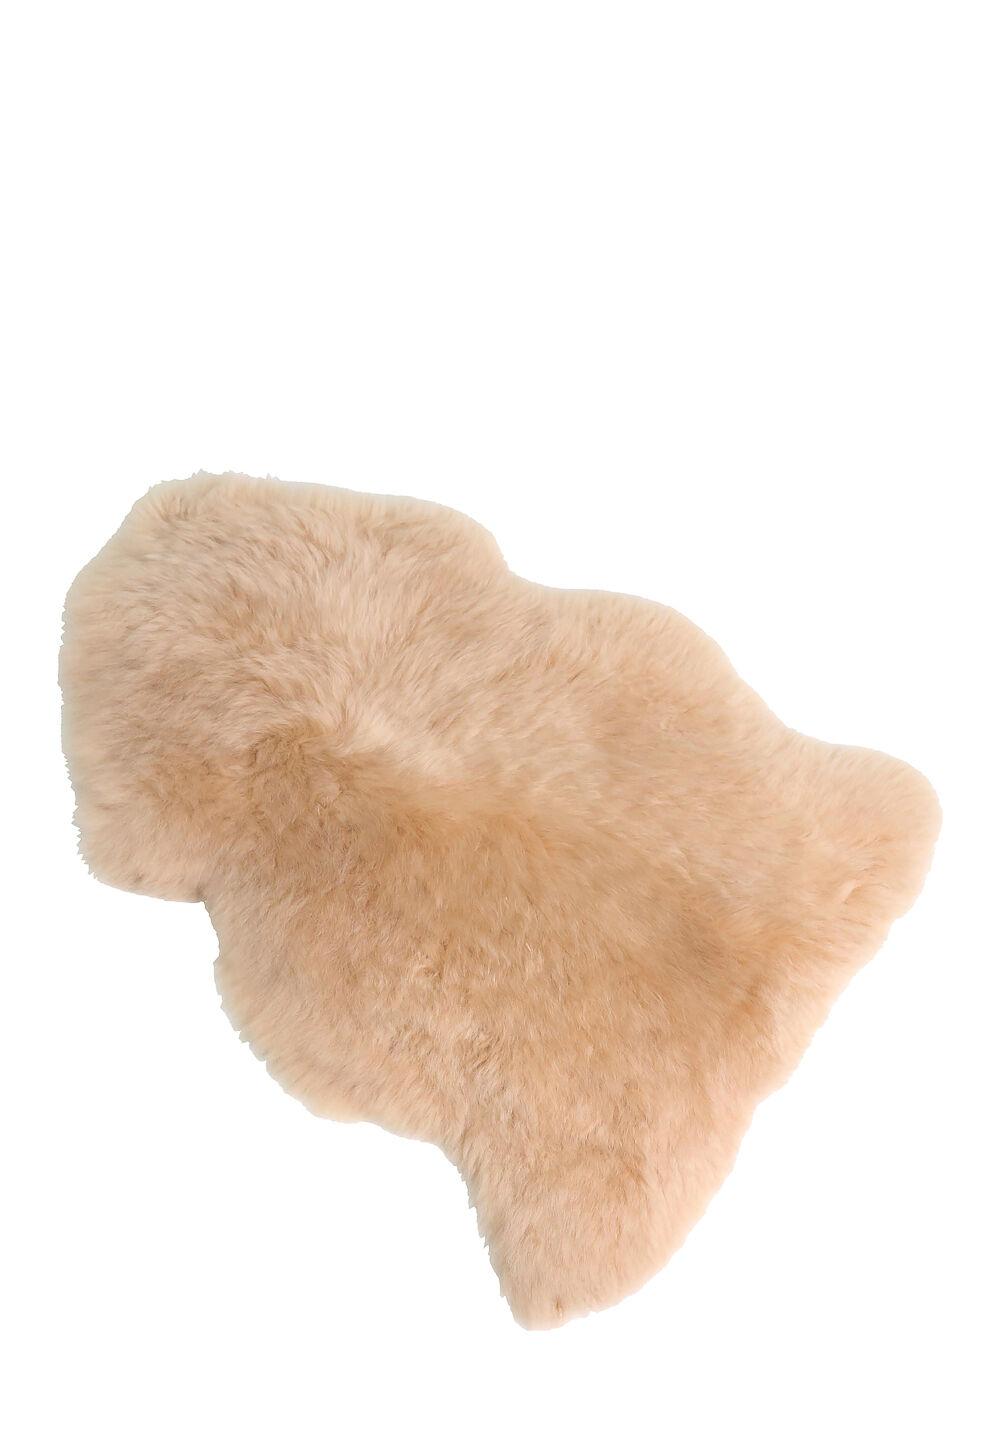 Kaiser Naturfellpro Dekorationsfell, Lammfell, L110+ cm beige